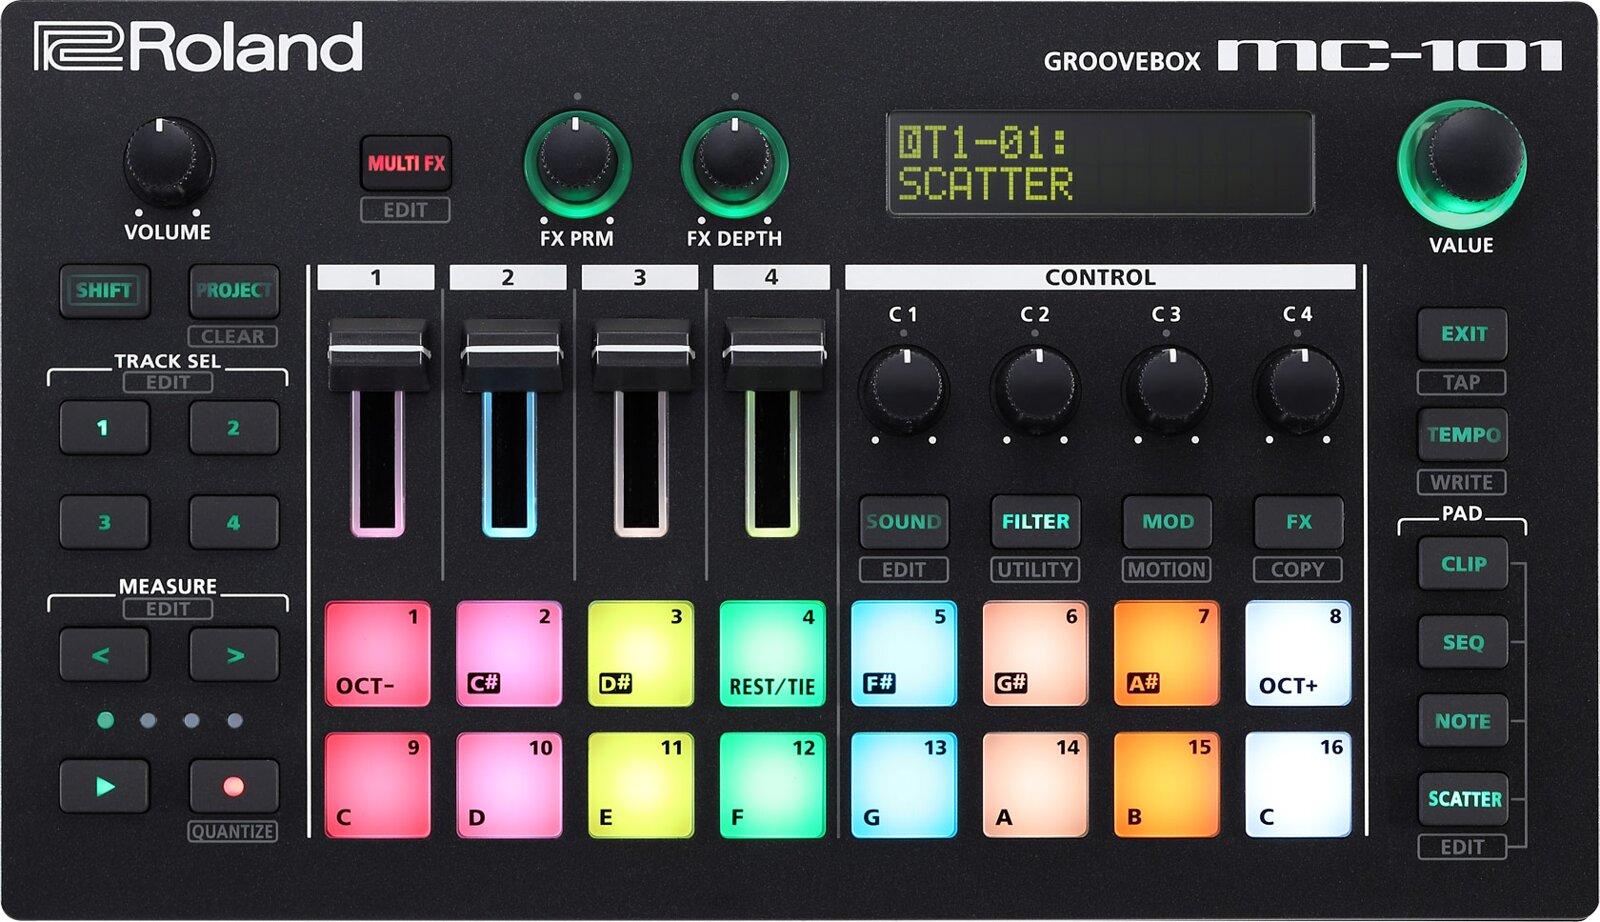 Roland MC-101 Groovebox : photo 1